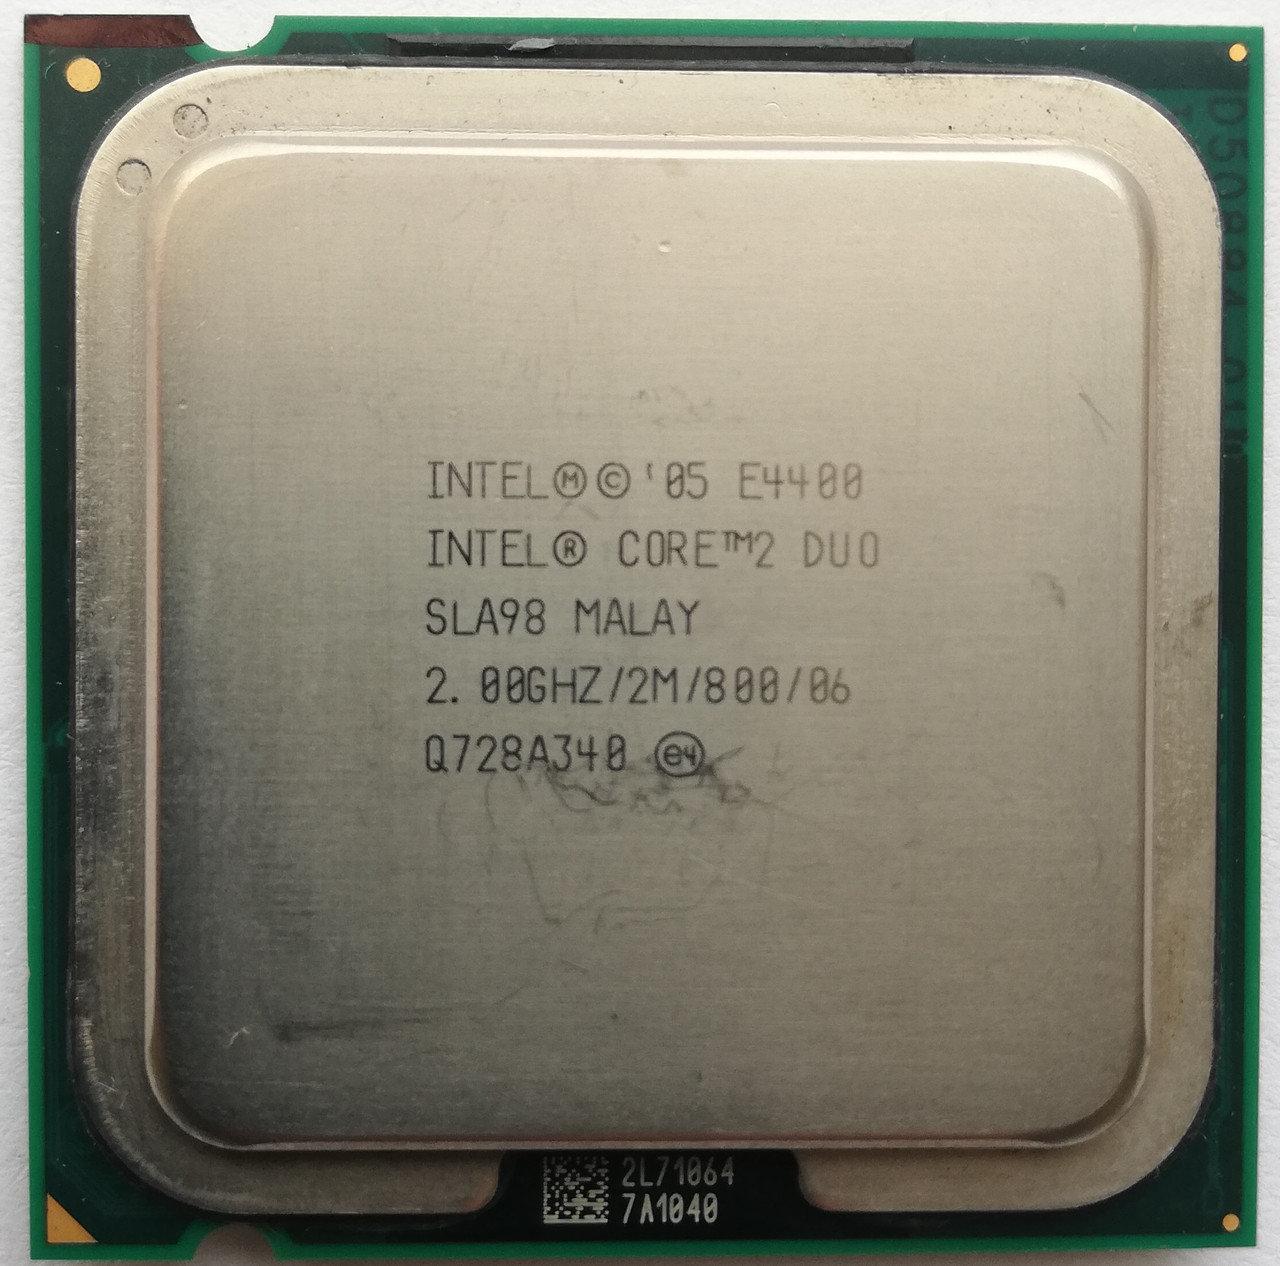 Процессор Intel Core 2 Duo E4400 M0 SLA98 2.00GHz 2M Cache 800 MHz FSB Socket 775 Б/У